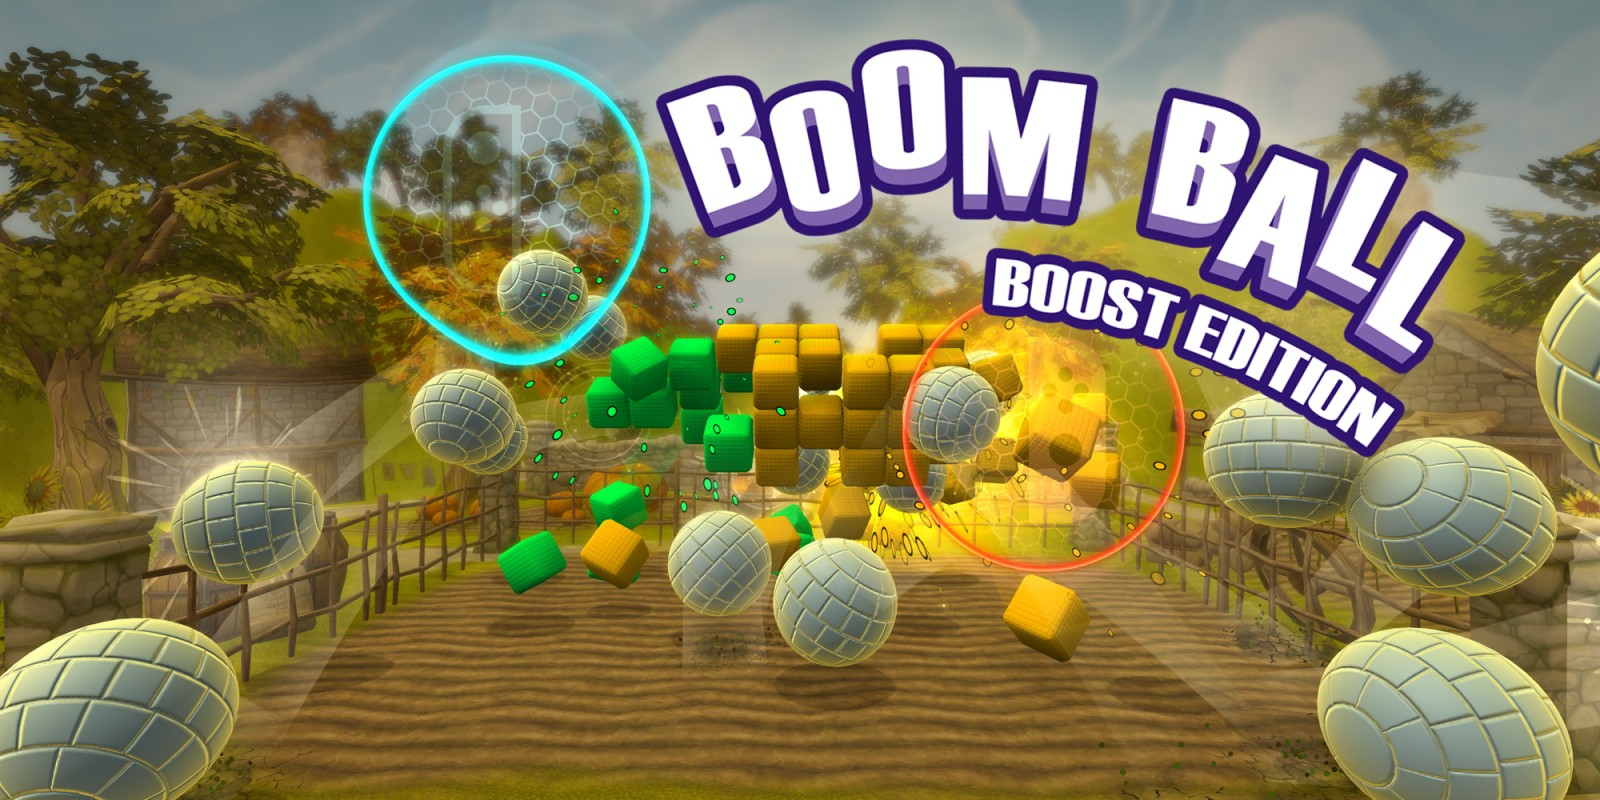 Boom Ball: Boost Edition